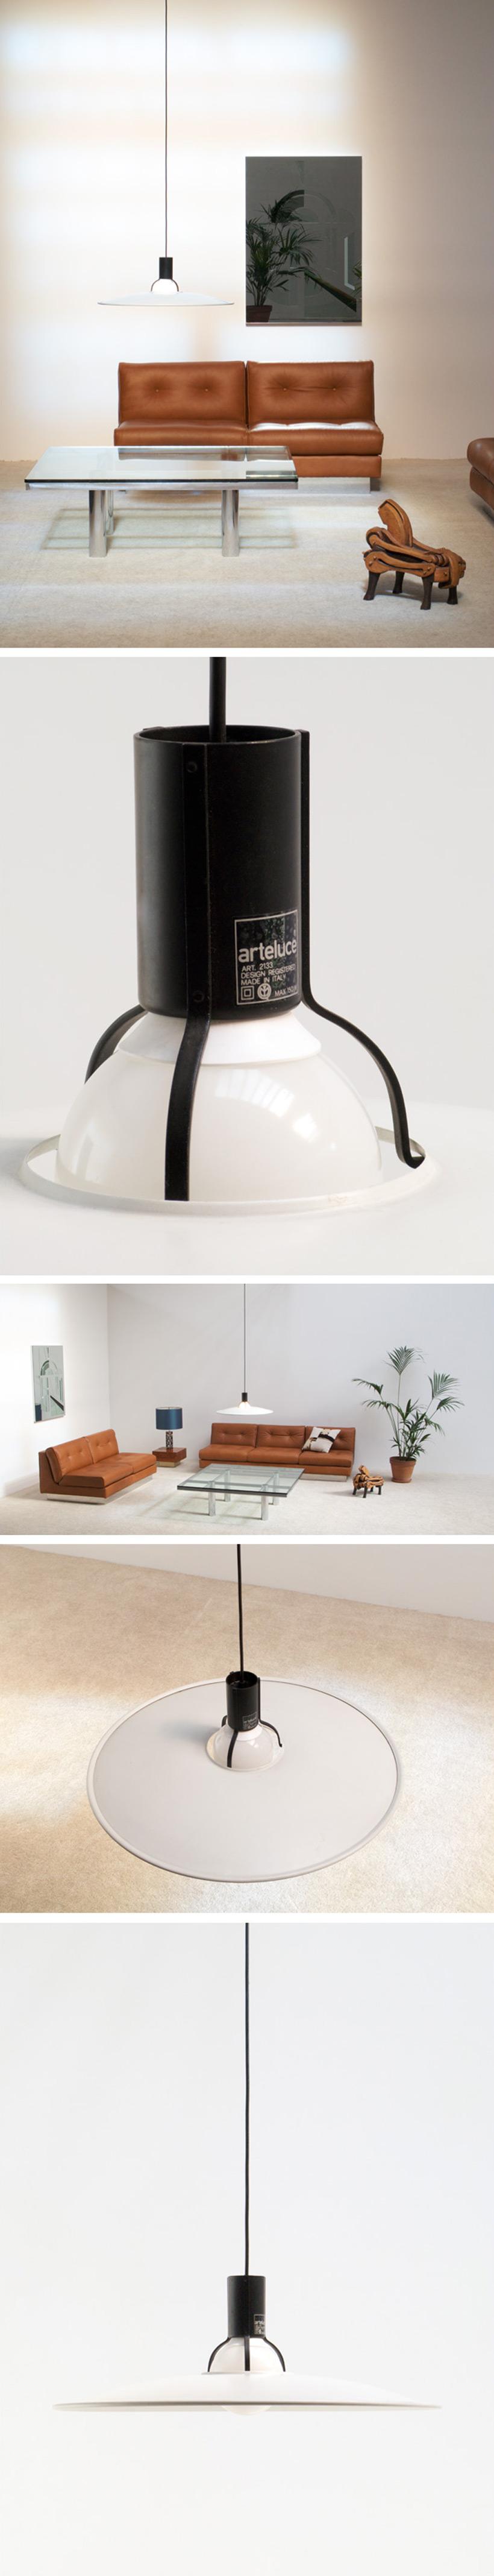 Gino Sarfatti Ceiling lamp 2133 Arteluce 1976 Large